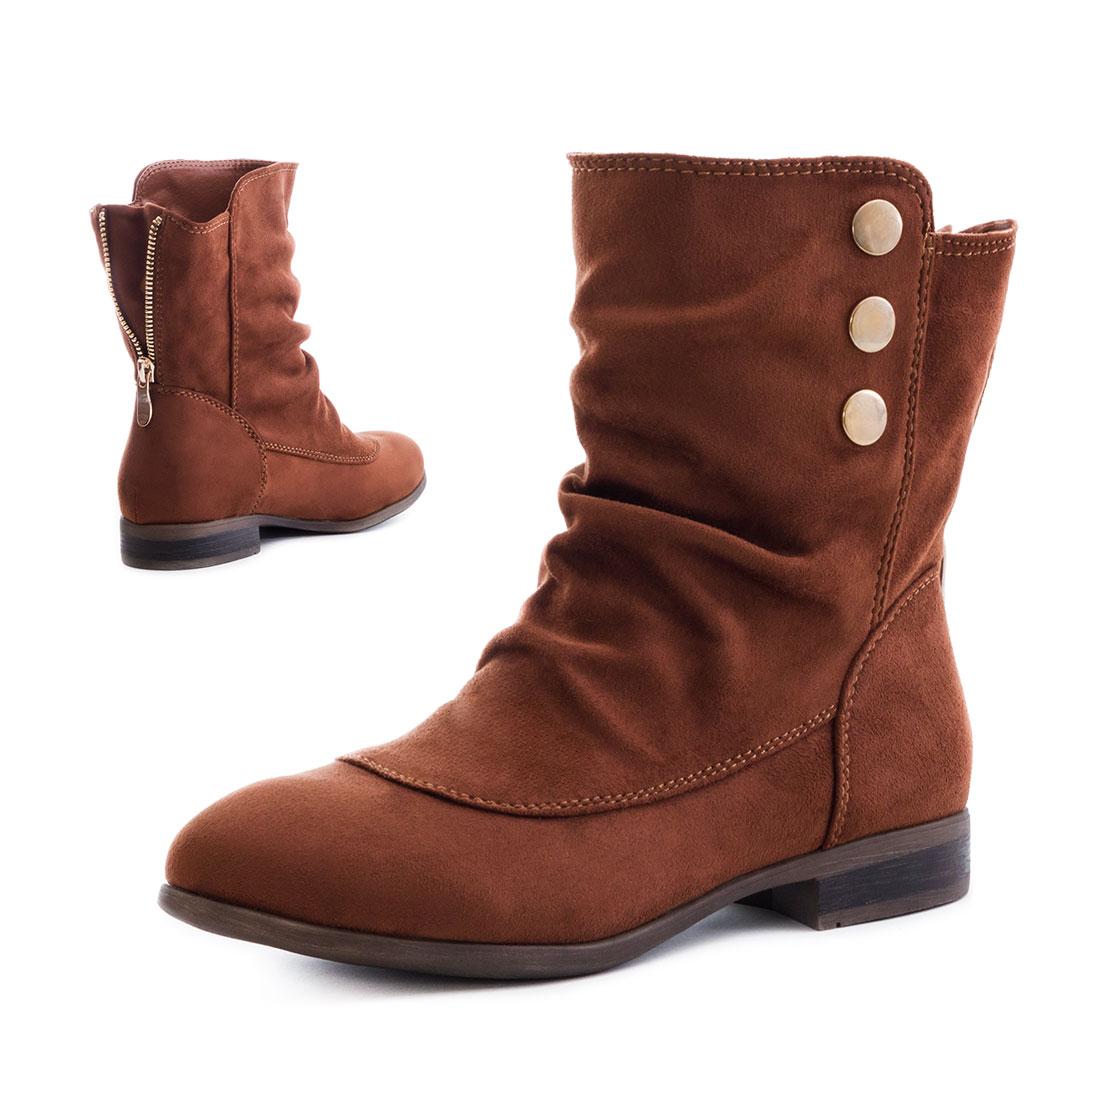 neu damen schlupf stiefeletten worker boots schuhe gr e 36 37 38 39 40 41 ebay. Black Bedroom Furniture Sets. Home Design Ideas